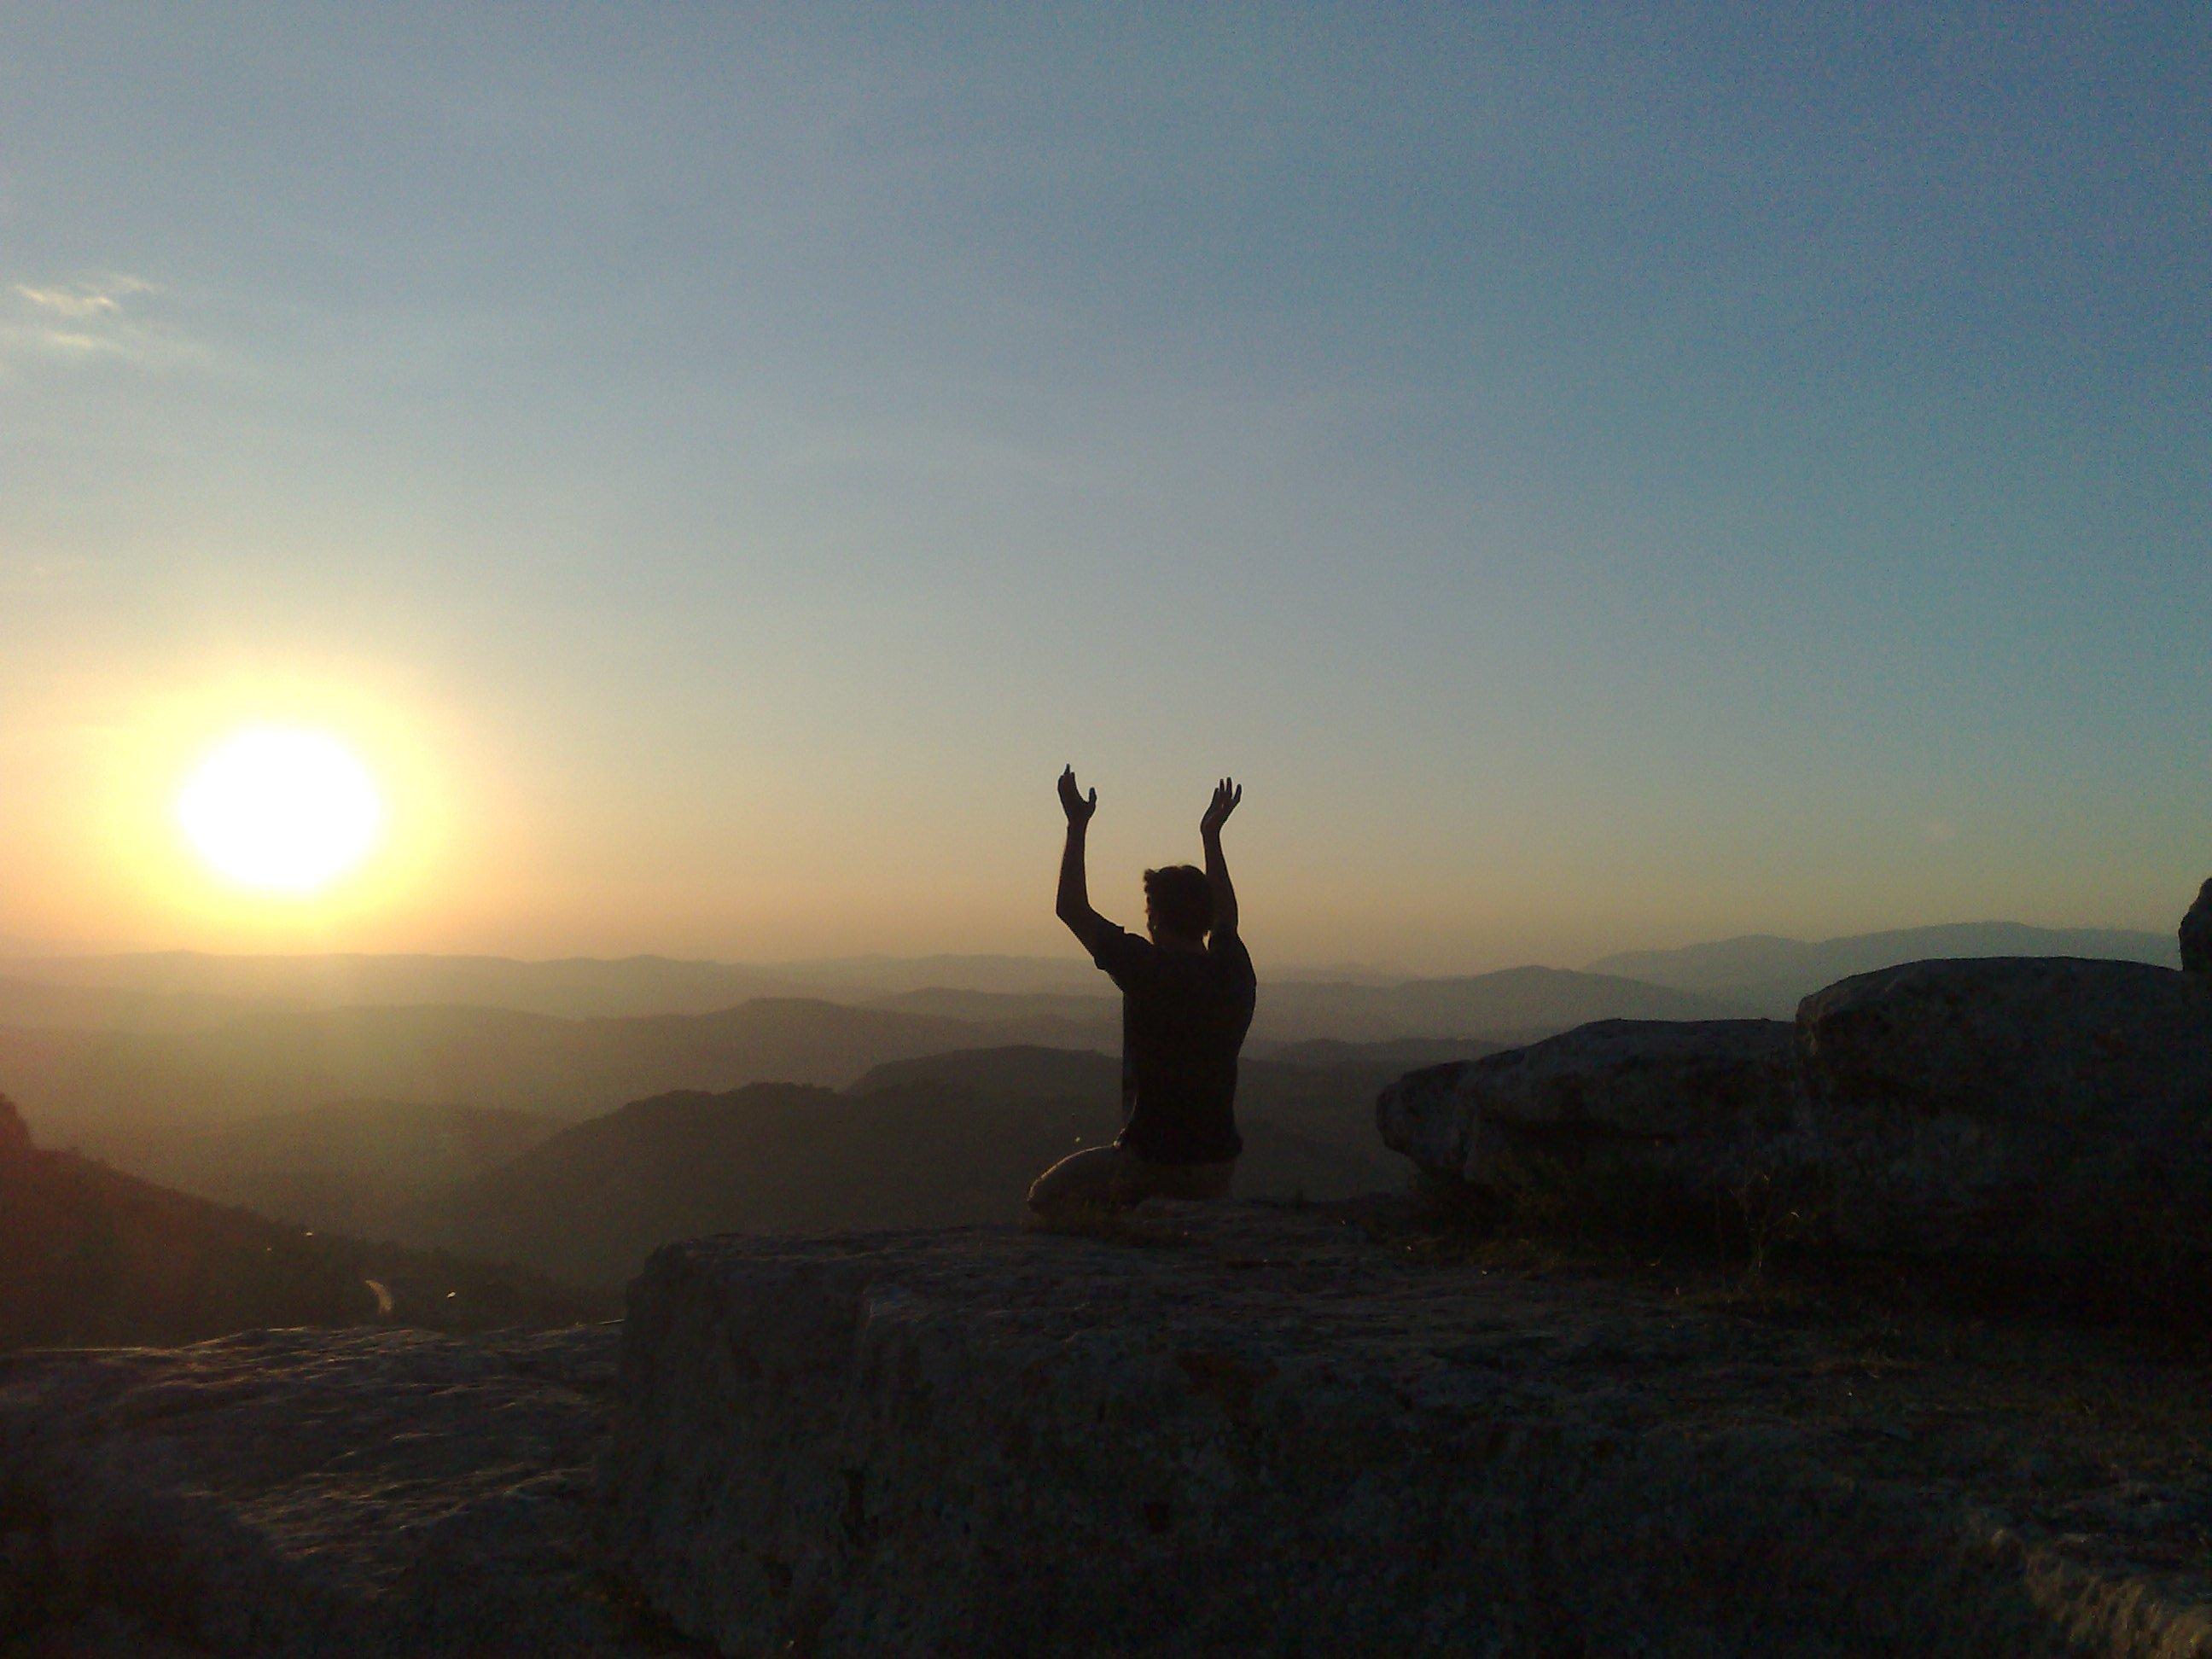 File:Pagan meditation.jpg - Wikimedia Commons